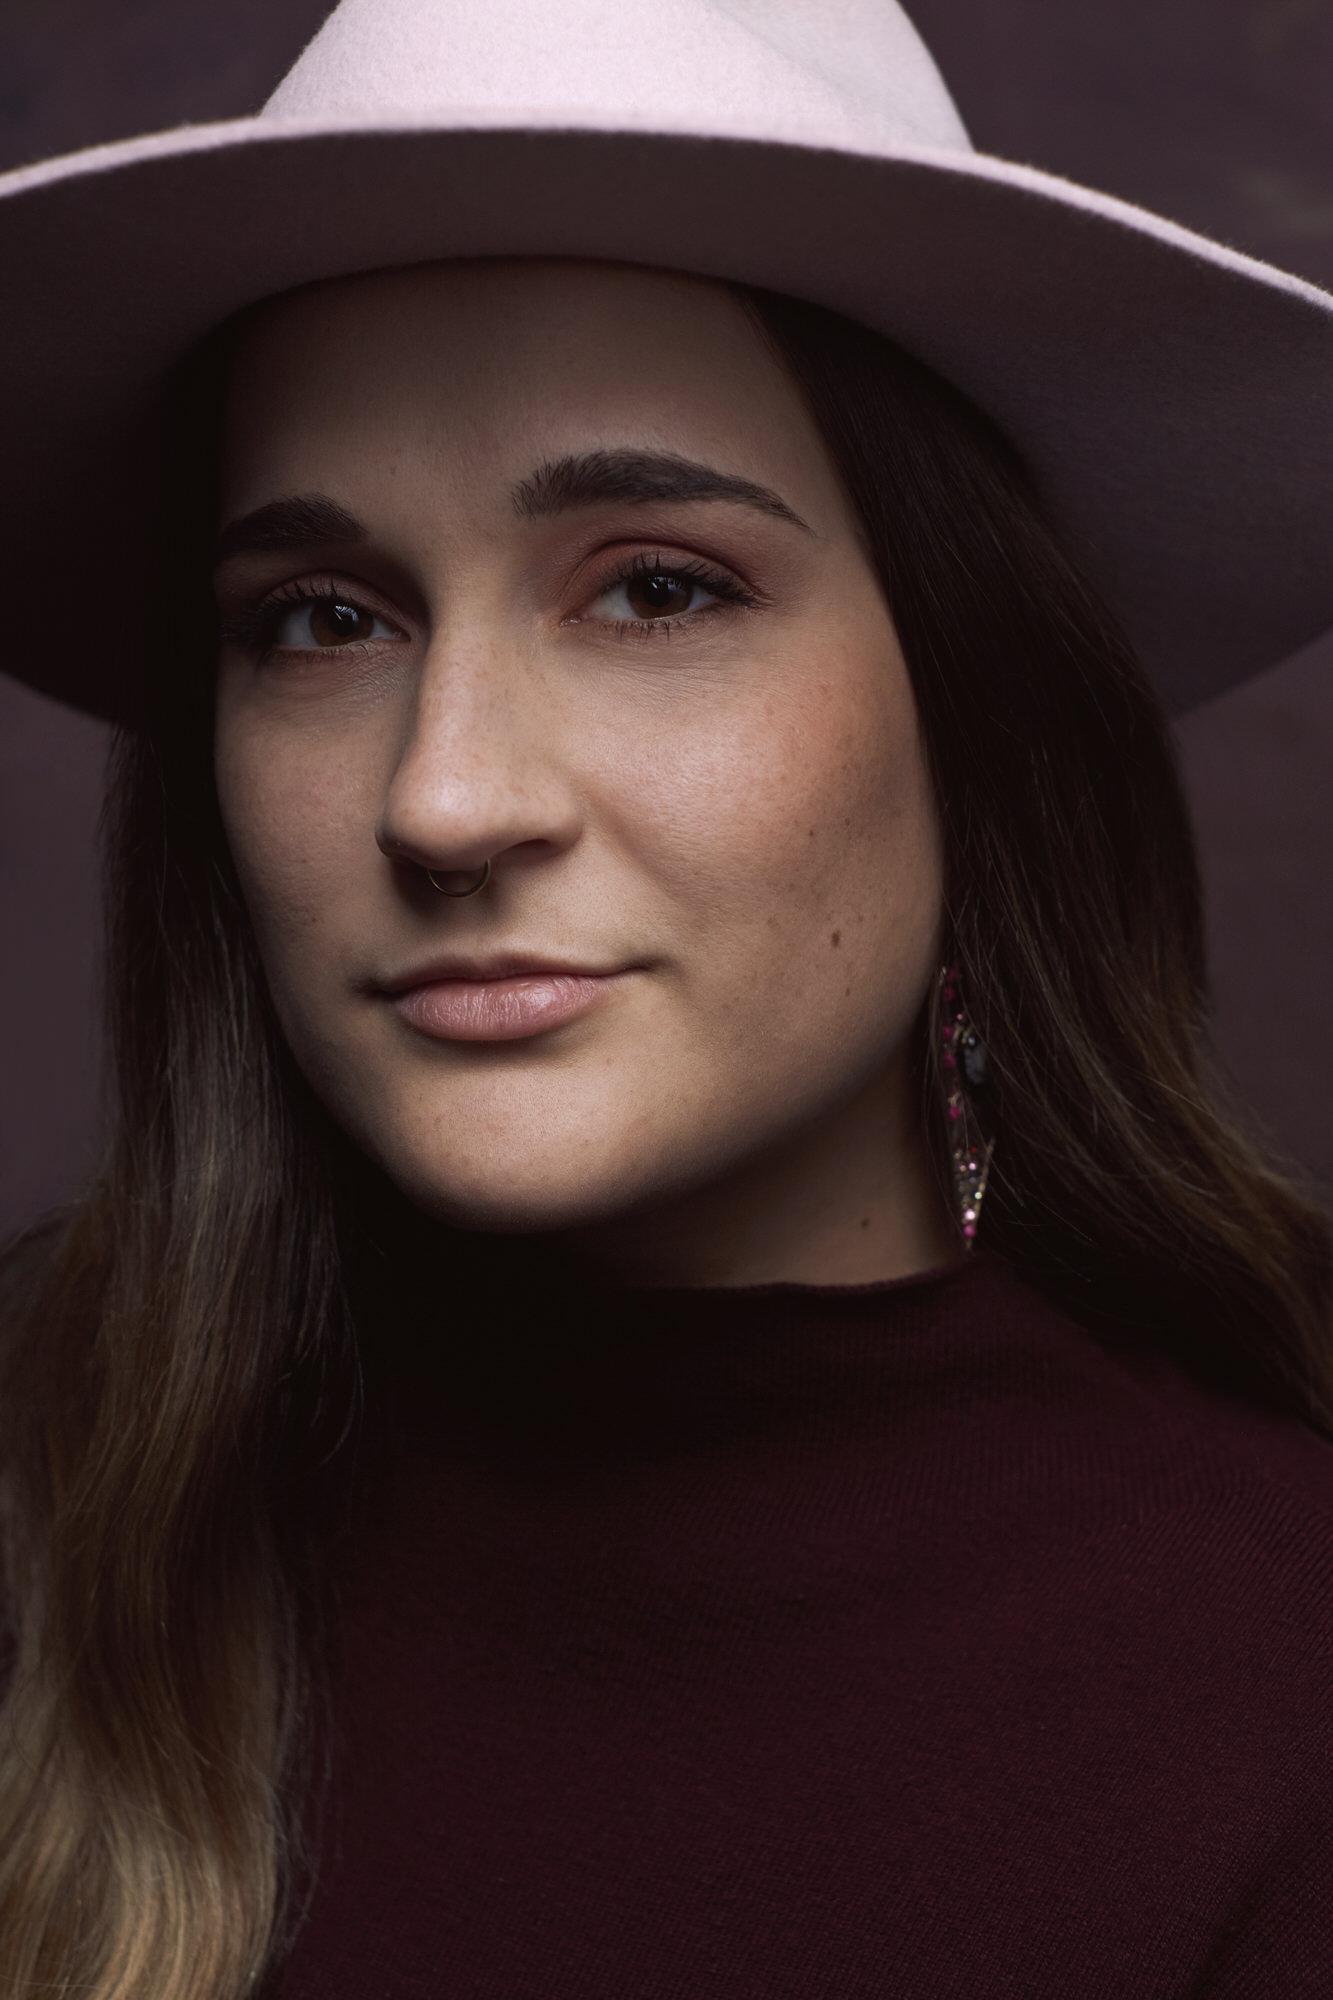 Megan Koshka - -Ryan-Parker-Photography-Edmonton-Headshots-Alberta-Headshot-Portrait-Photographer-Corporate-Actor-Business-Professional-Acting-Studio-Calgary.jpg